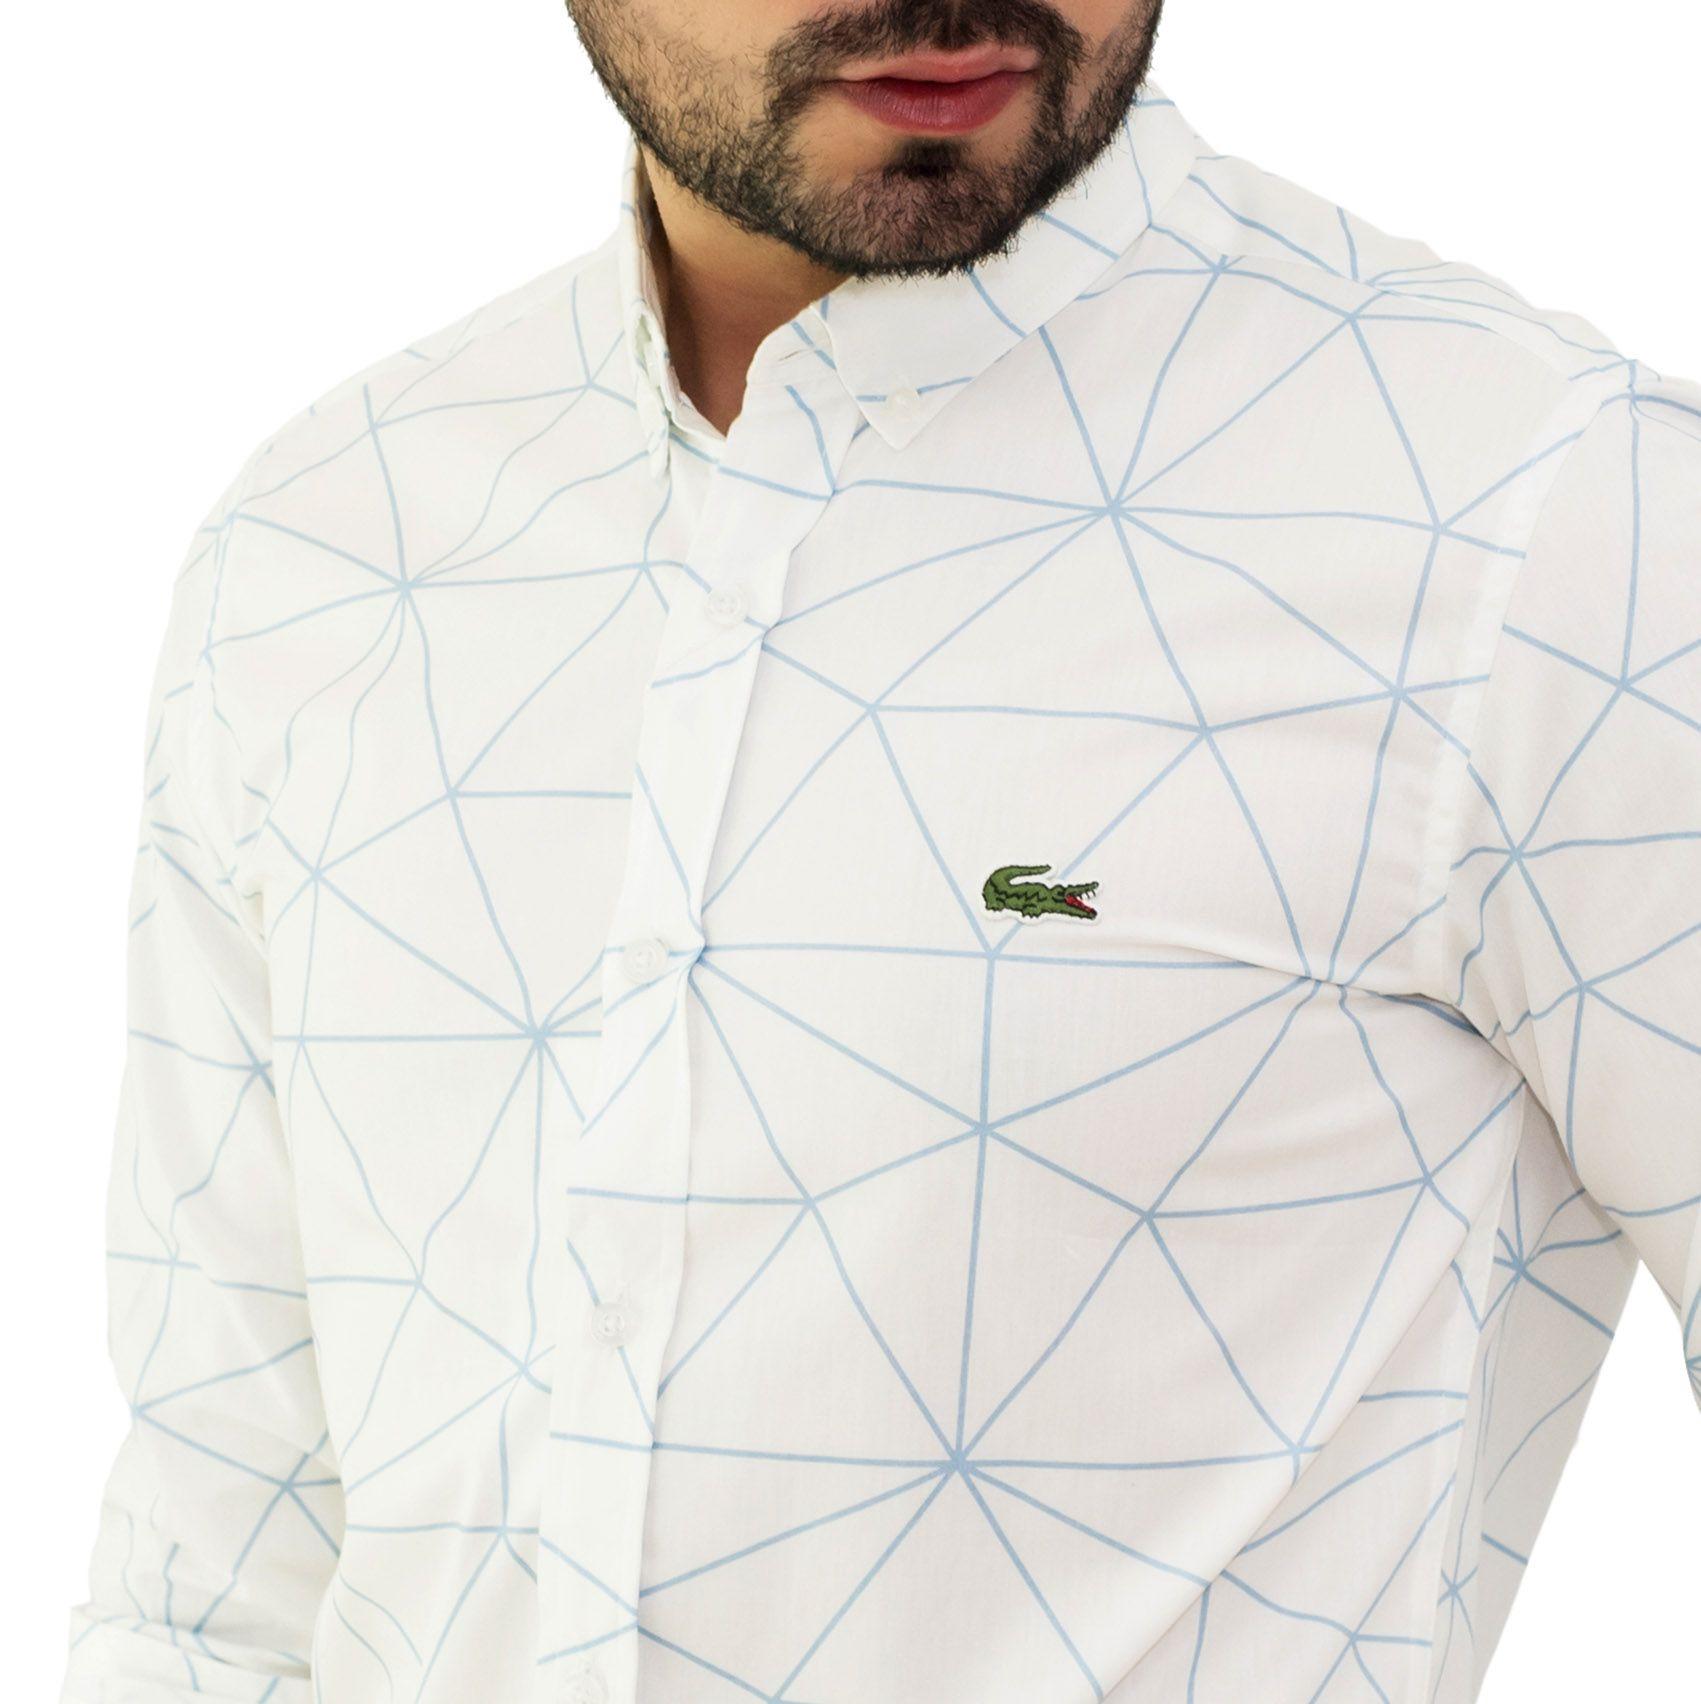 Camisa Social LCT Branca Desenho  - Ca Brasileira